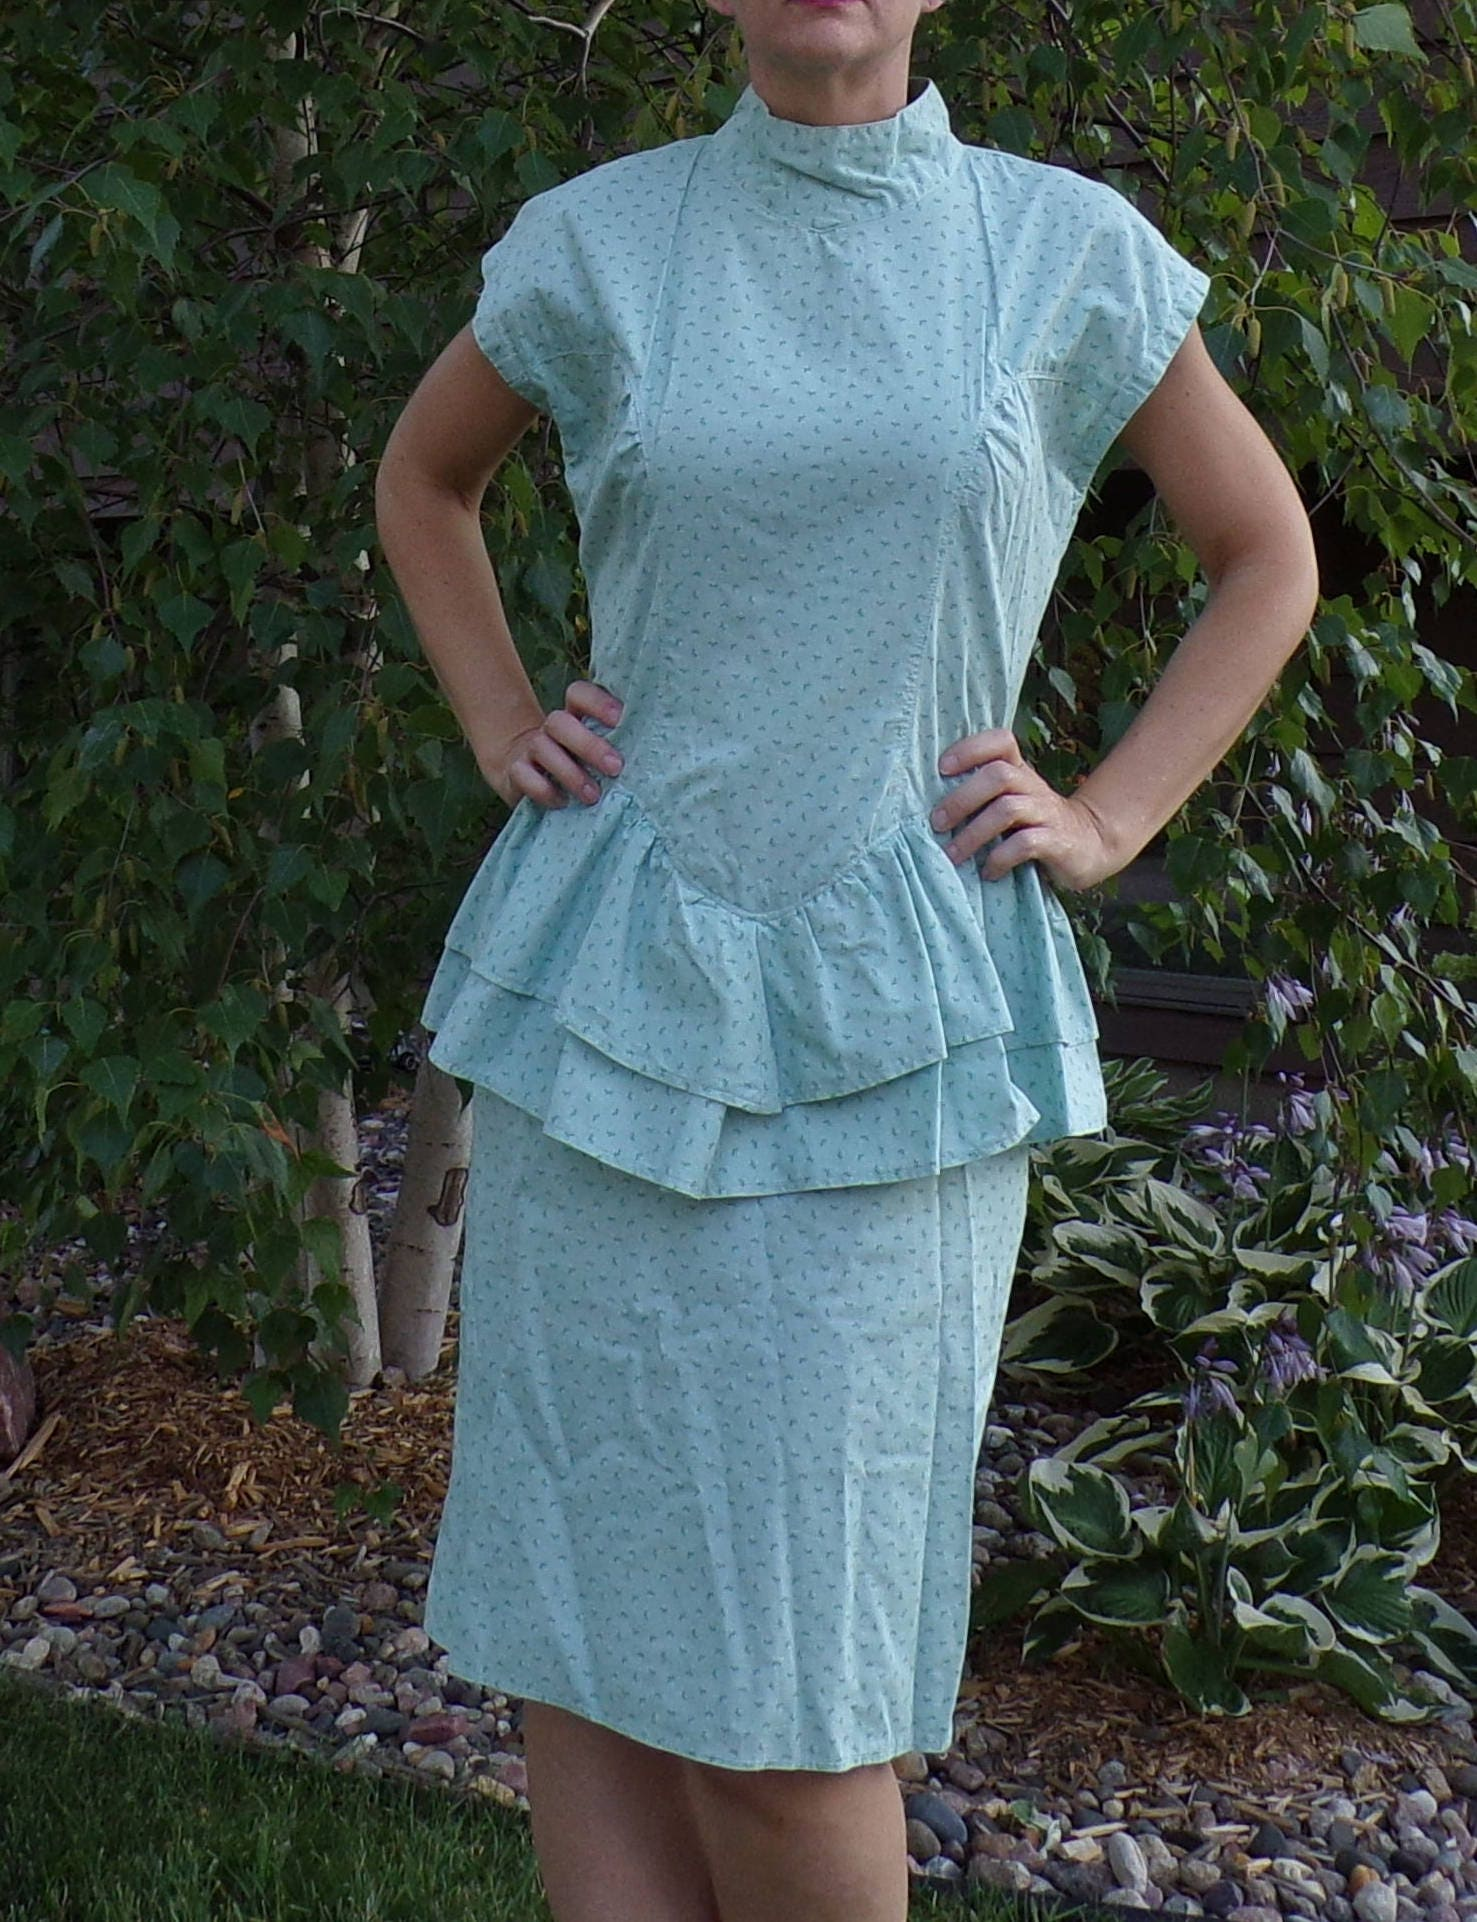 80s Dresses | Casual to Party Dresses Mint Green 1980s Cotton Peplum Dress Calico M  D7 $20.00 AT vintagedancer.com